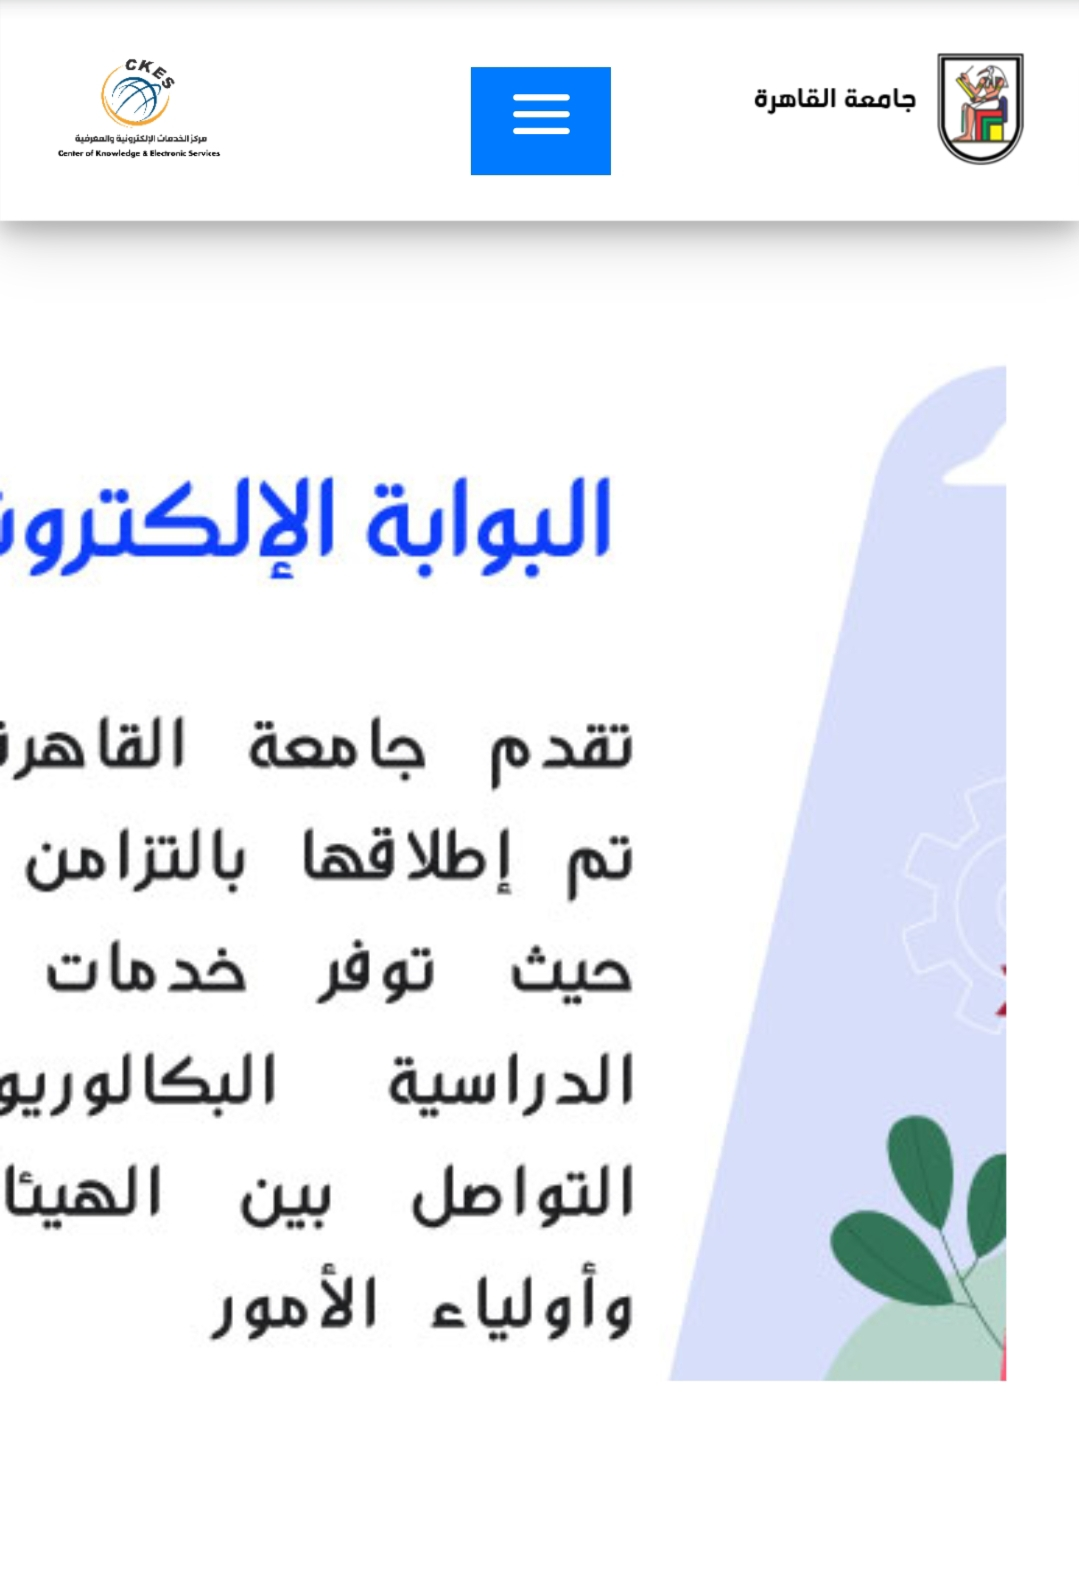 IMG ٢٠٢١٠١٠٤ ١٨٢٢١٦ - رابط منصة جامعة القاهرة للتعليم عن بعد eservices.cu.edu.eg